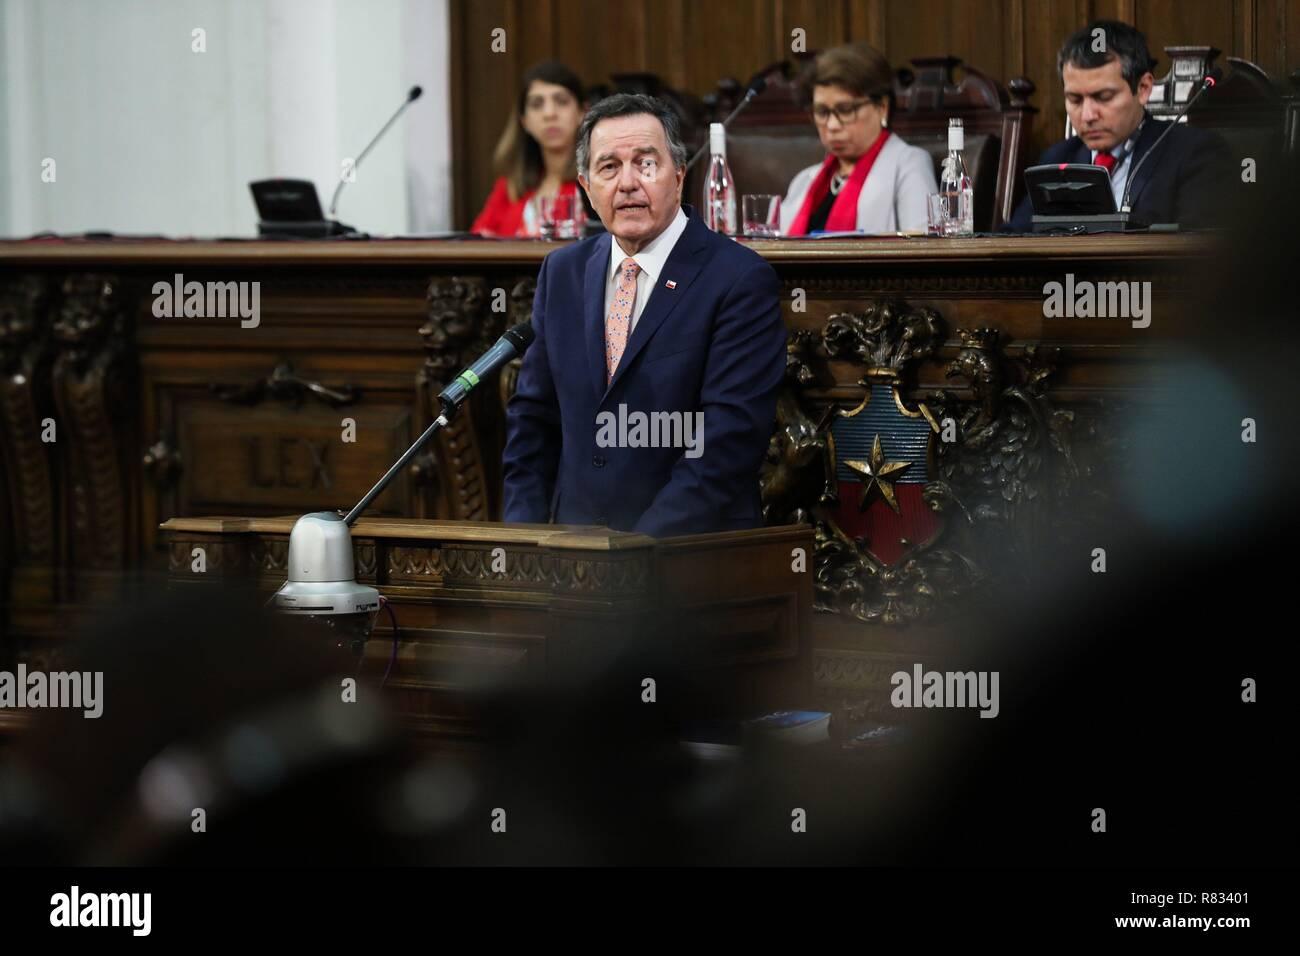 Santiago De Chile, Chile  12th Dec, 2018  Foreign Minister of Chile